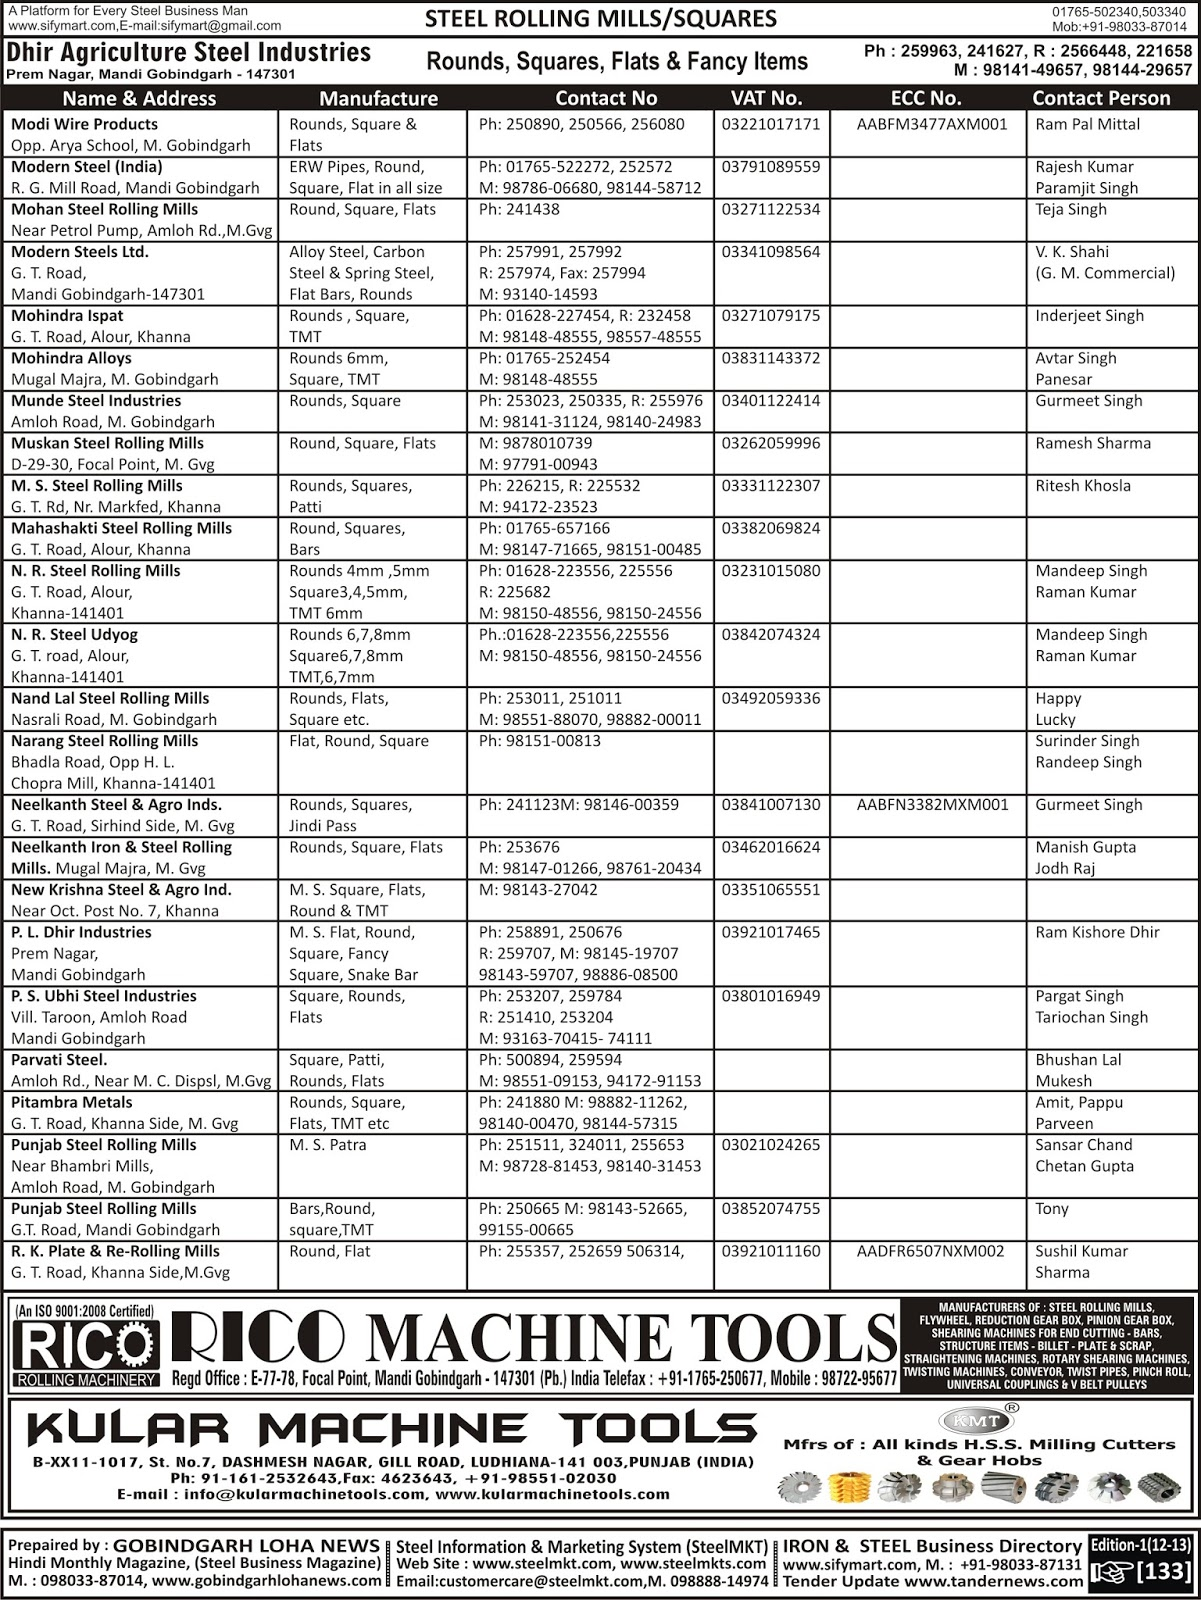 Mandi Gobindgarh Steel Industries directory: 2016